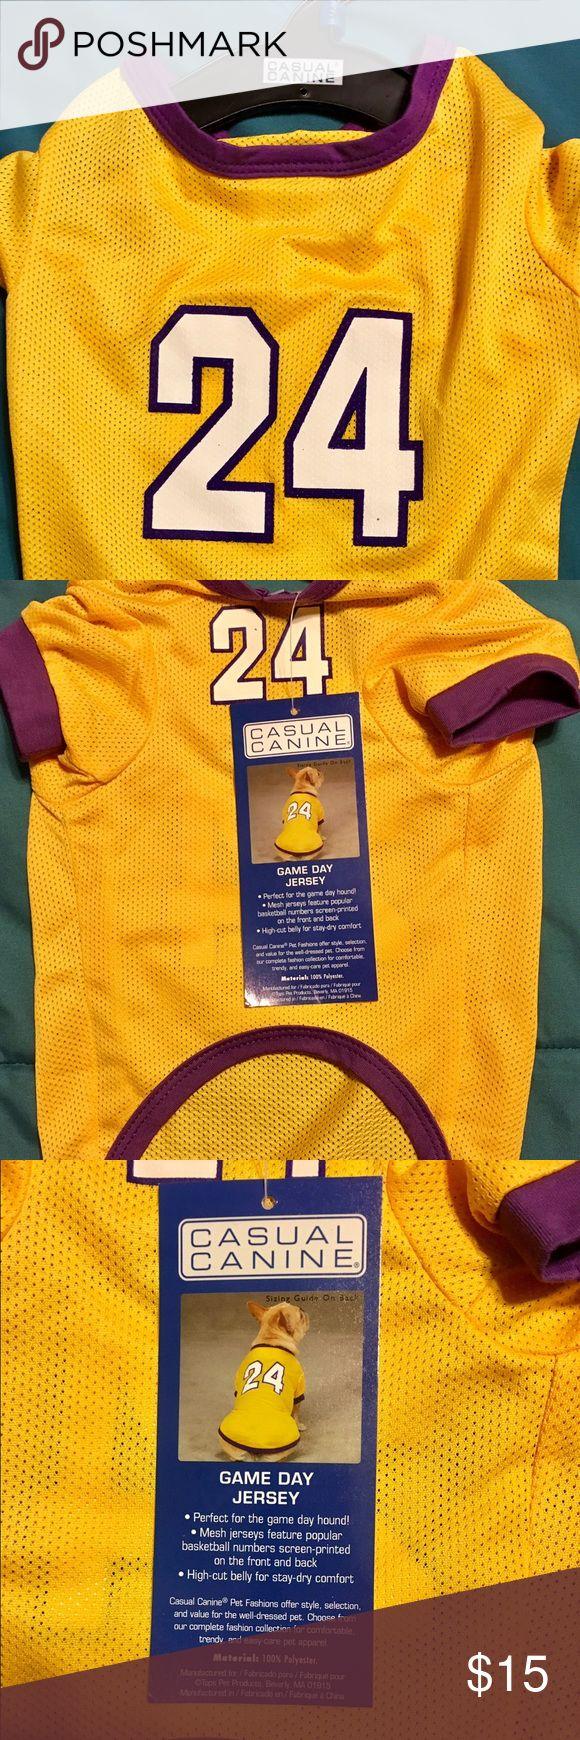 16ddedc3f ... Kobe Bryant 24 Dog Pet Mesh Jersey NWT SmallMedium 24 Kobe Bryant Dog  Jersey La Lakers NBA Pet Puppy Mesh T Shirt Clothes Apparel .